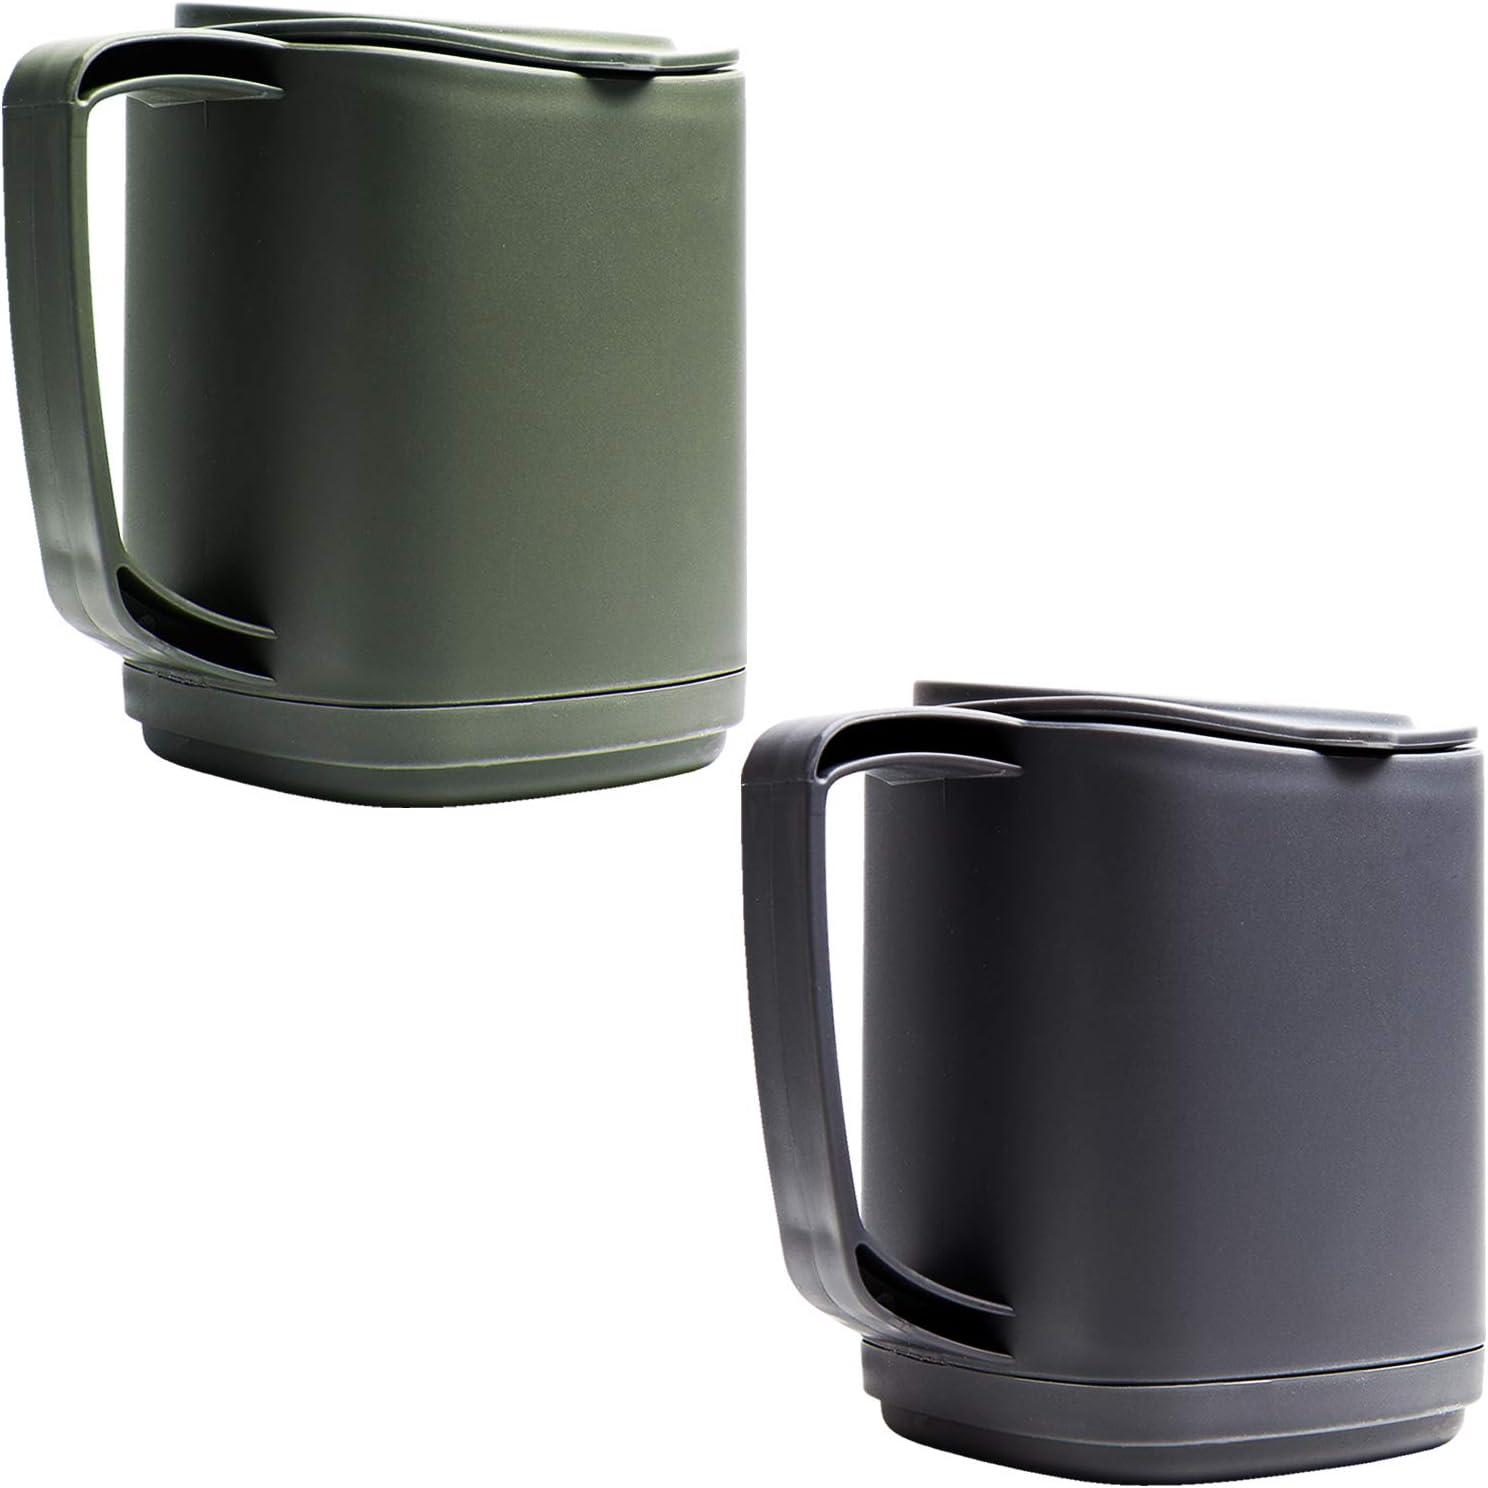 Karpfenangeln Thermo Becher Ridgemonkey Thermo-Mug